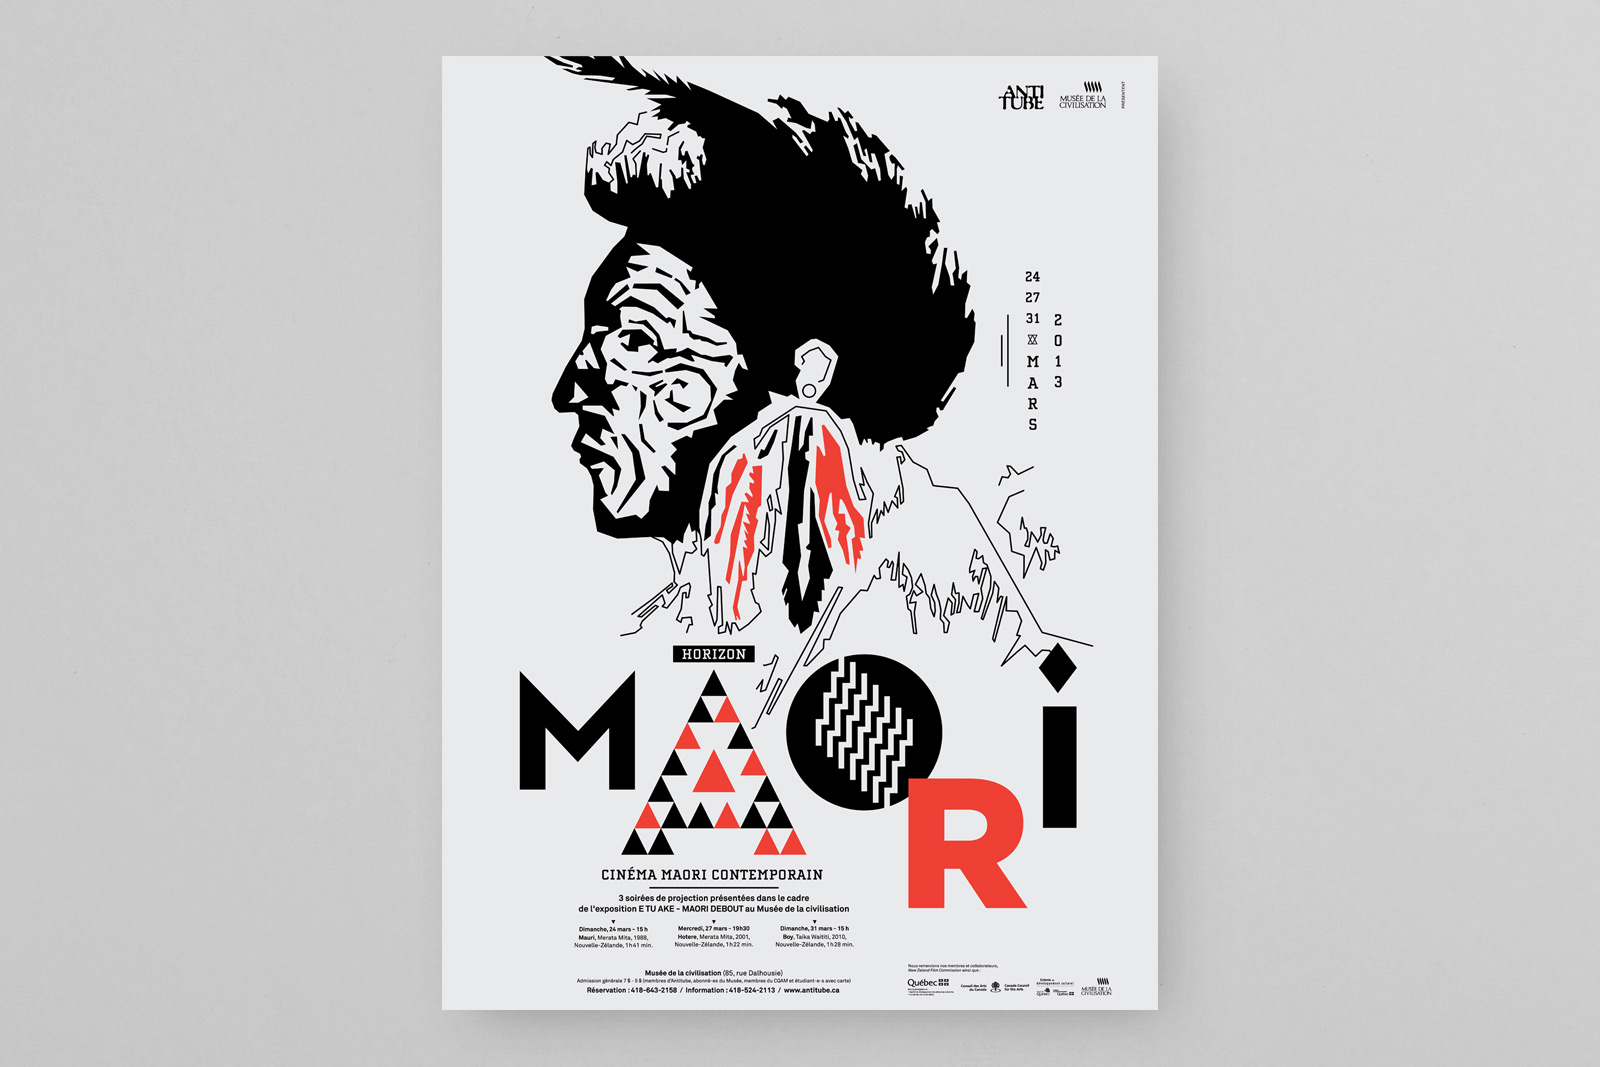 Figure-JeremyHall-Antitube-Affiche-Cinema-Maori2.jpg